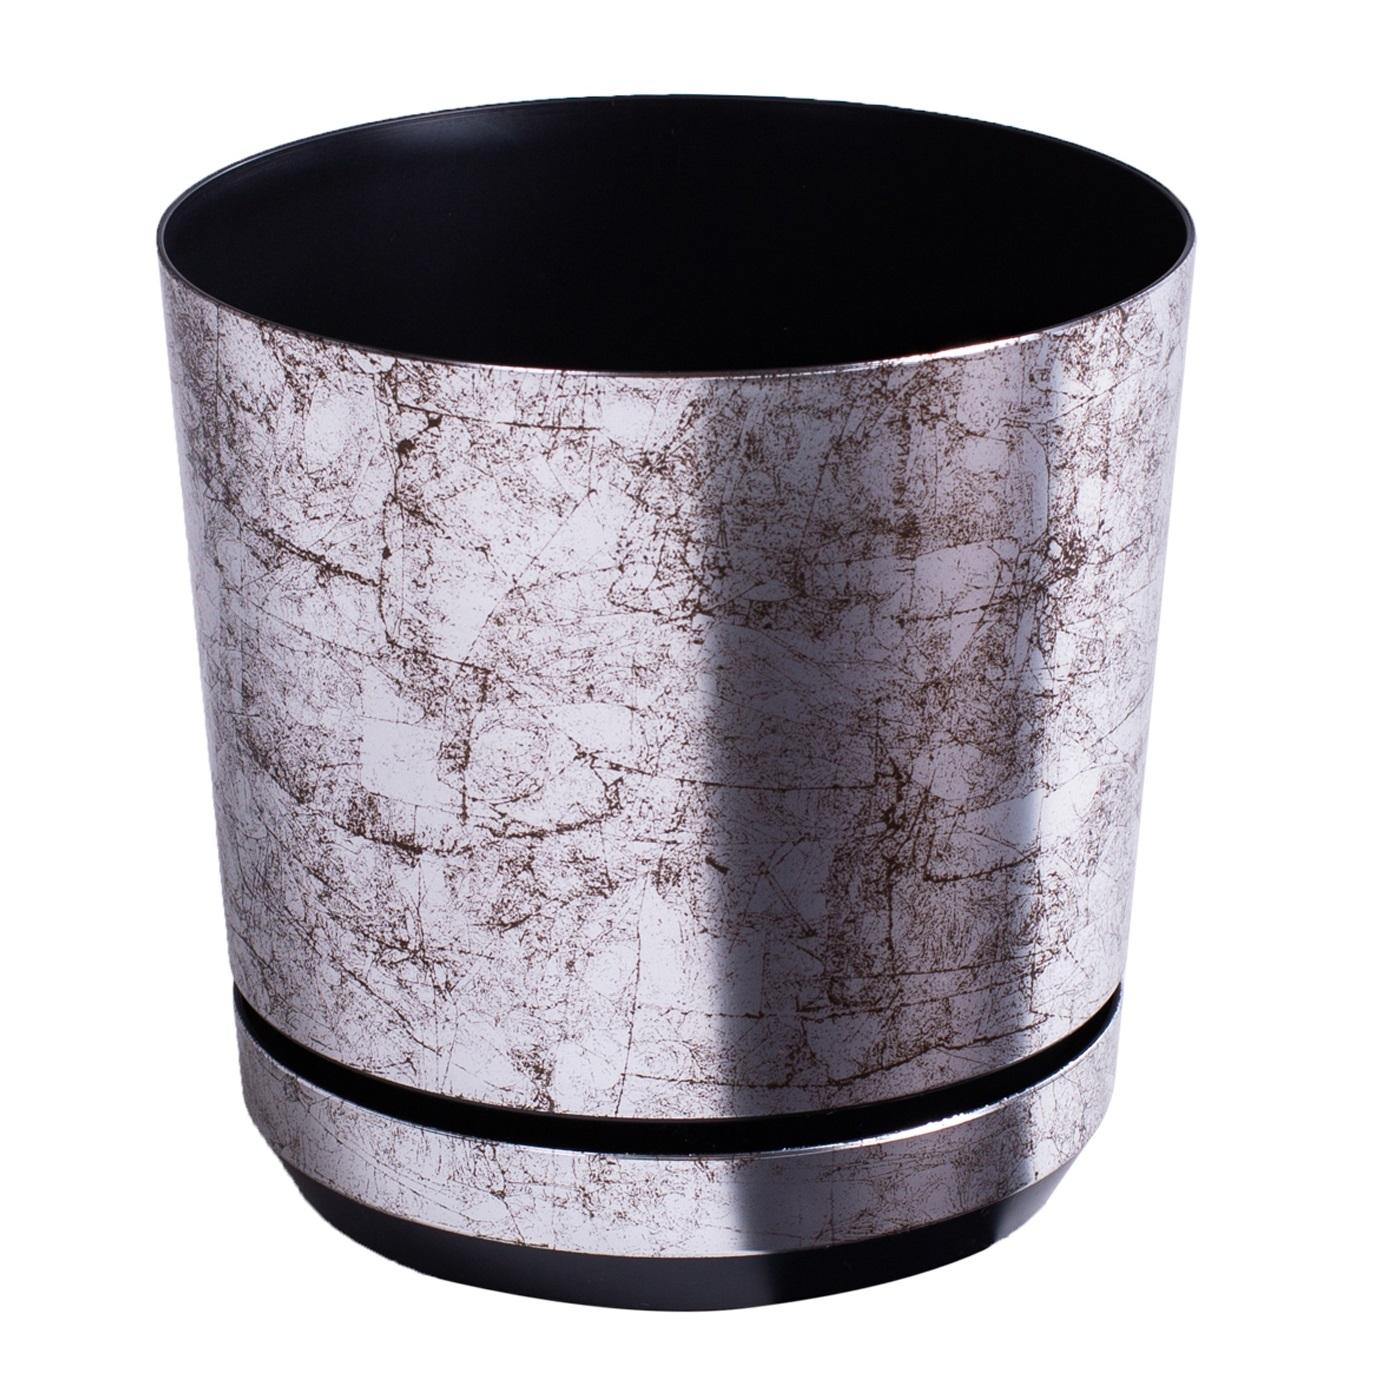 Doniczka okr±g³a Dekor - 14 cm - stare srebro